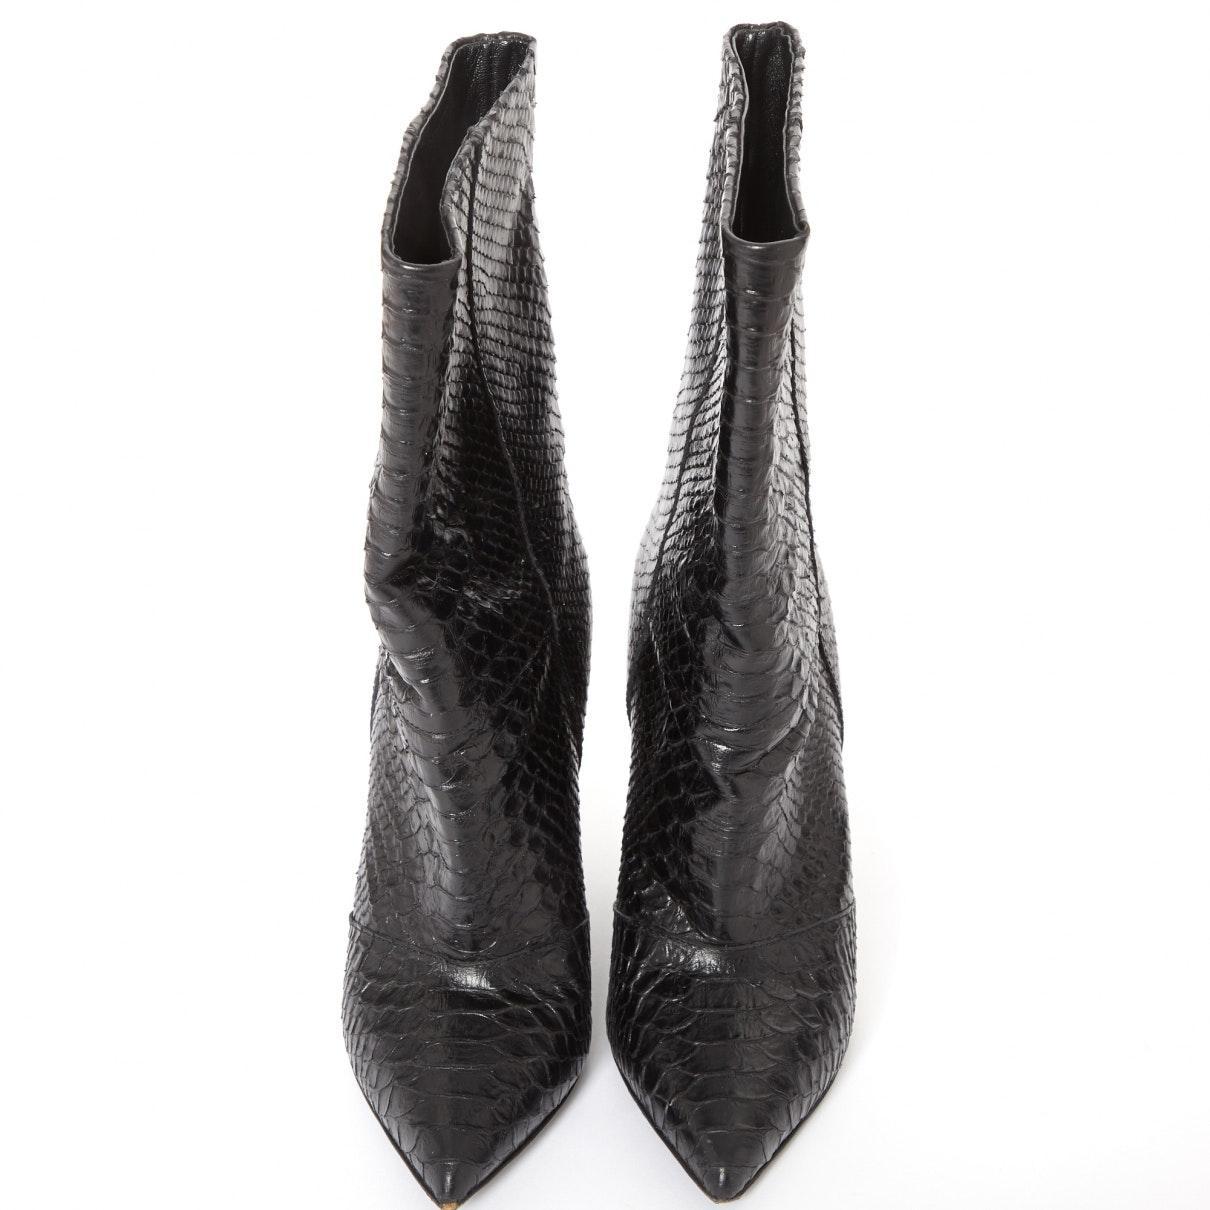 Bottes N en Cuir Noir Cuir Giuseppe Zanotti en coloris Noir